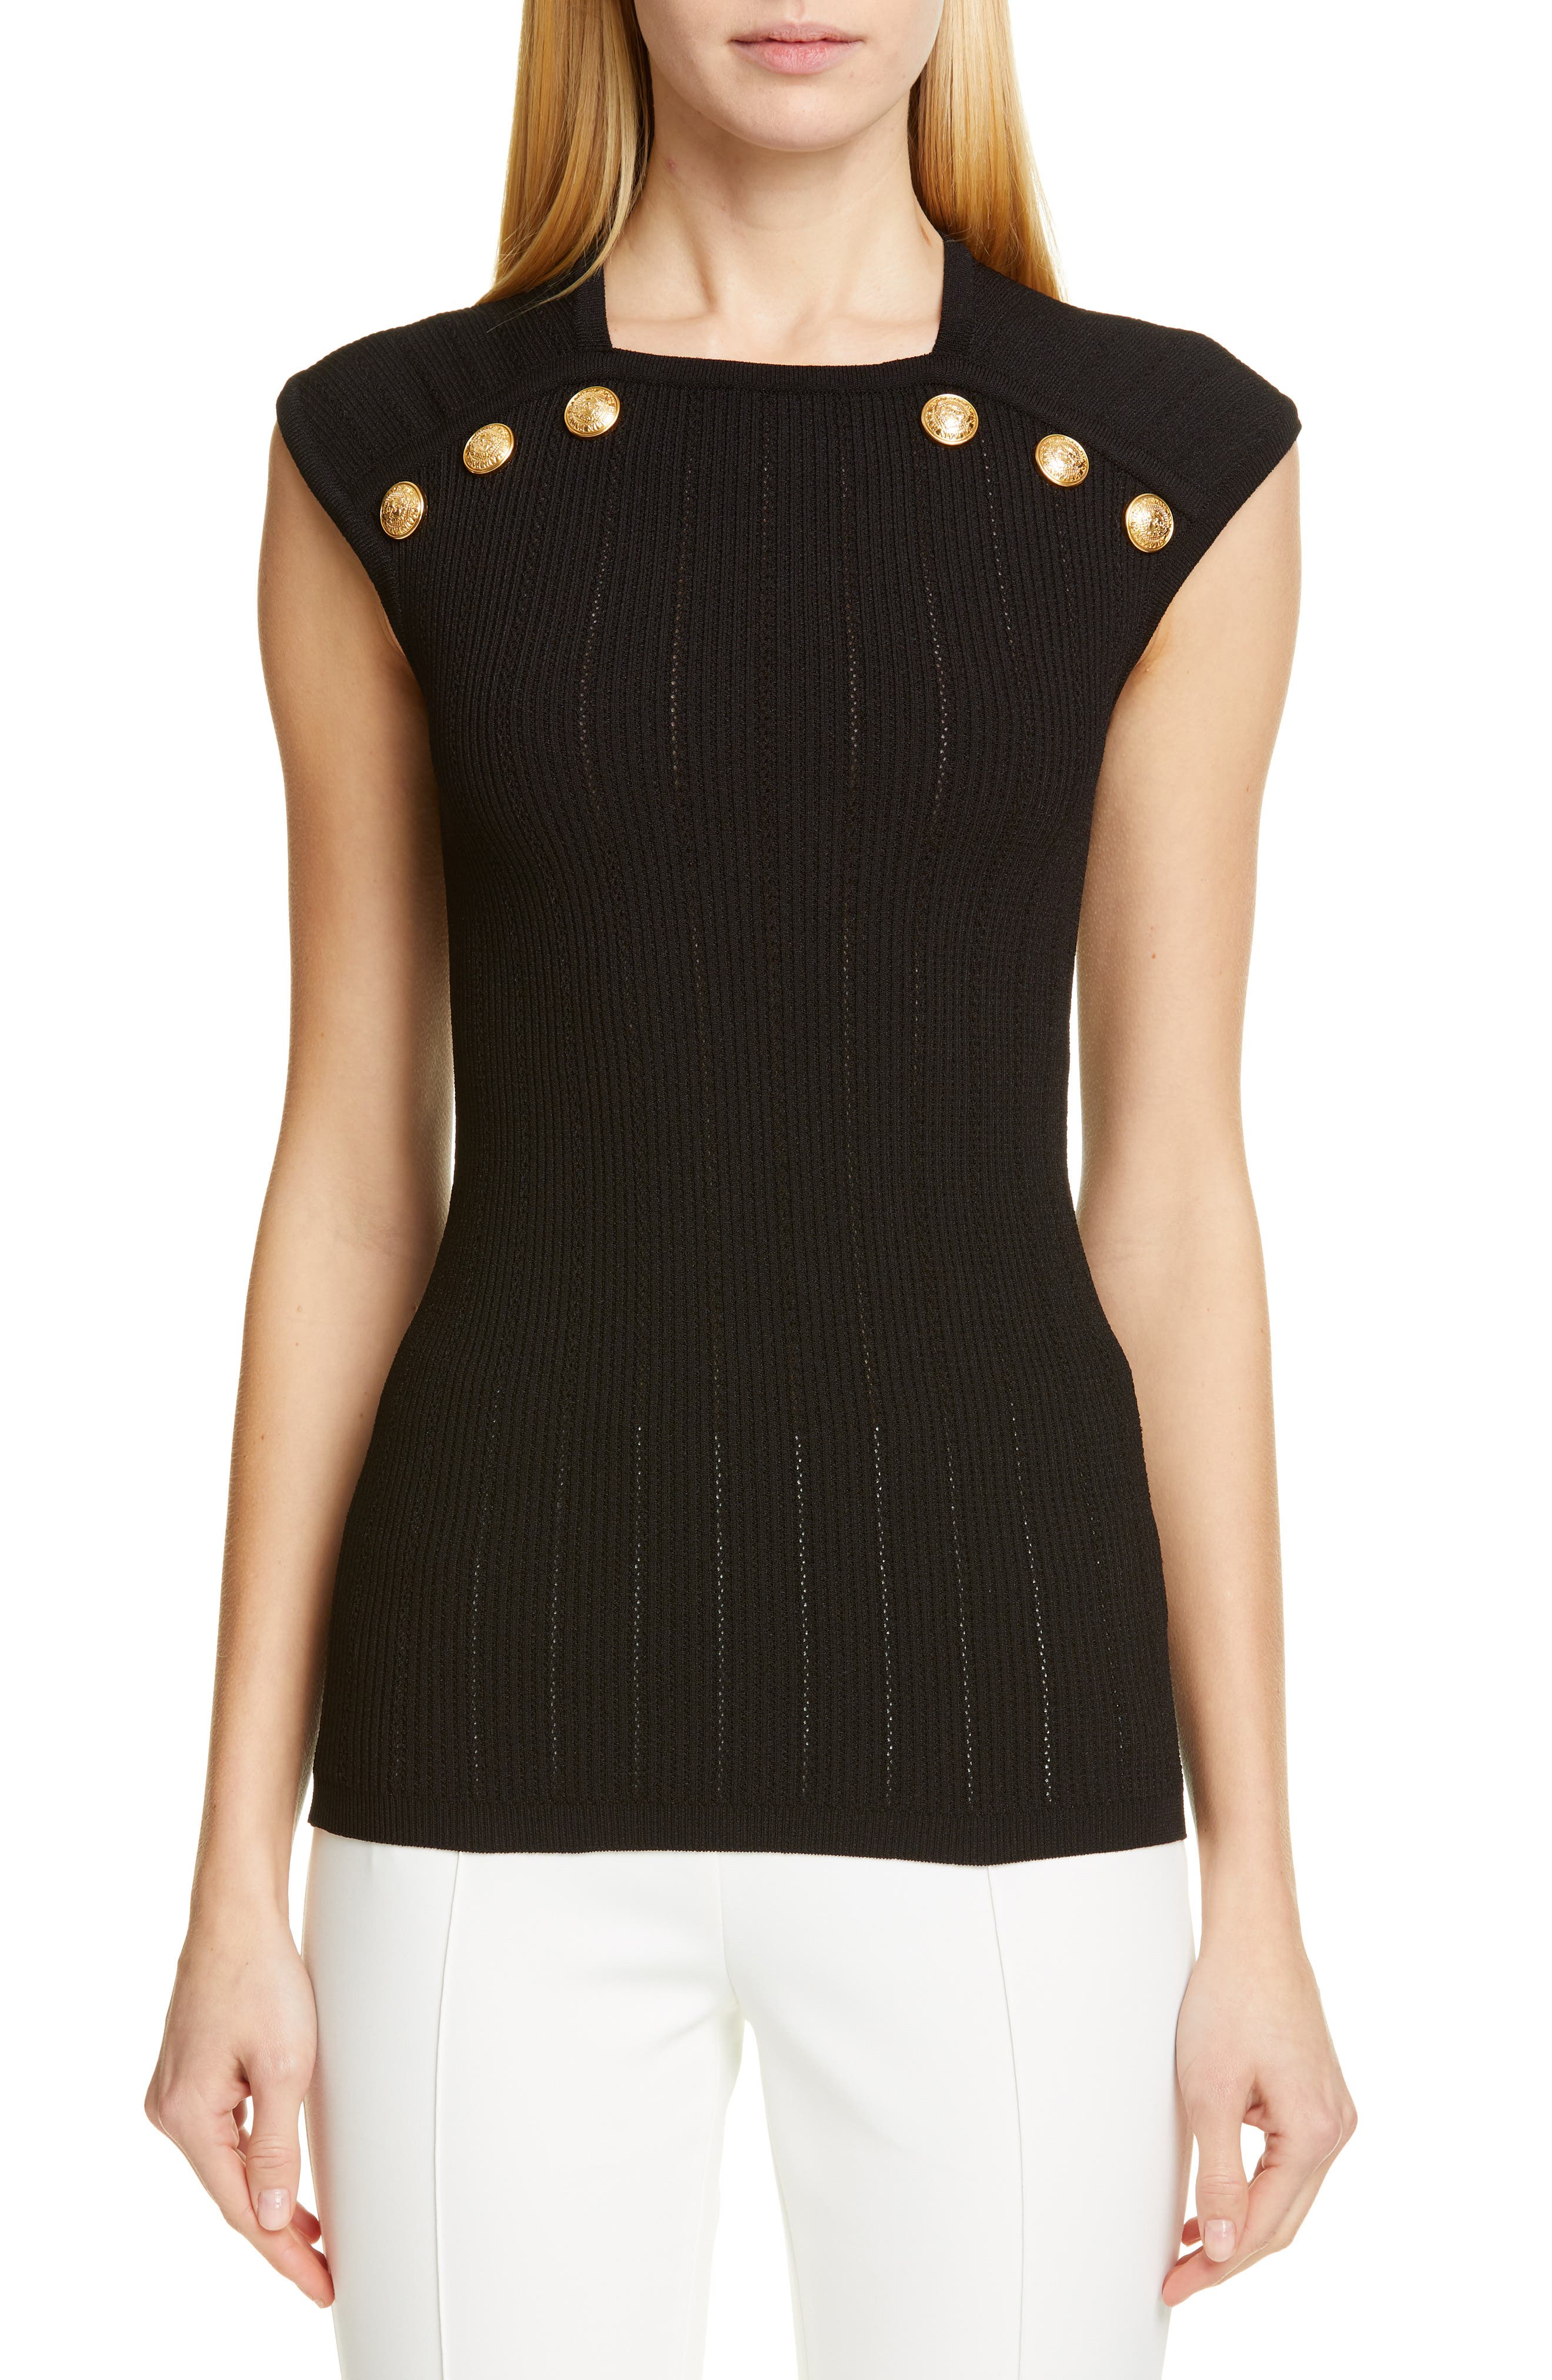 BALMAIN Shoulder Button Rib Knit Top, Main, color, 0PA NOIR